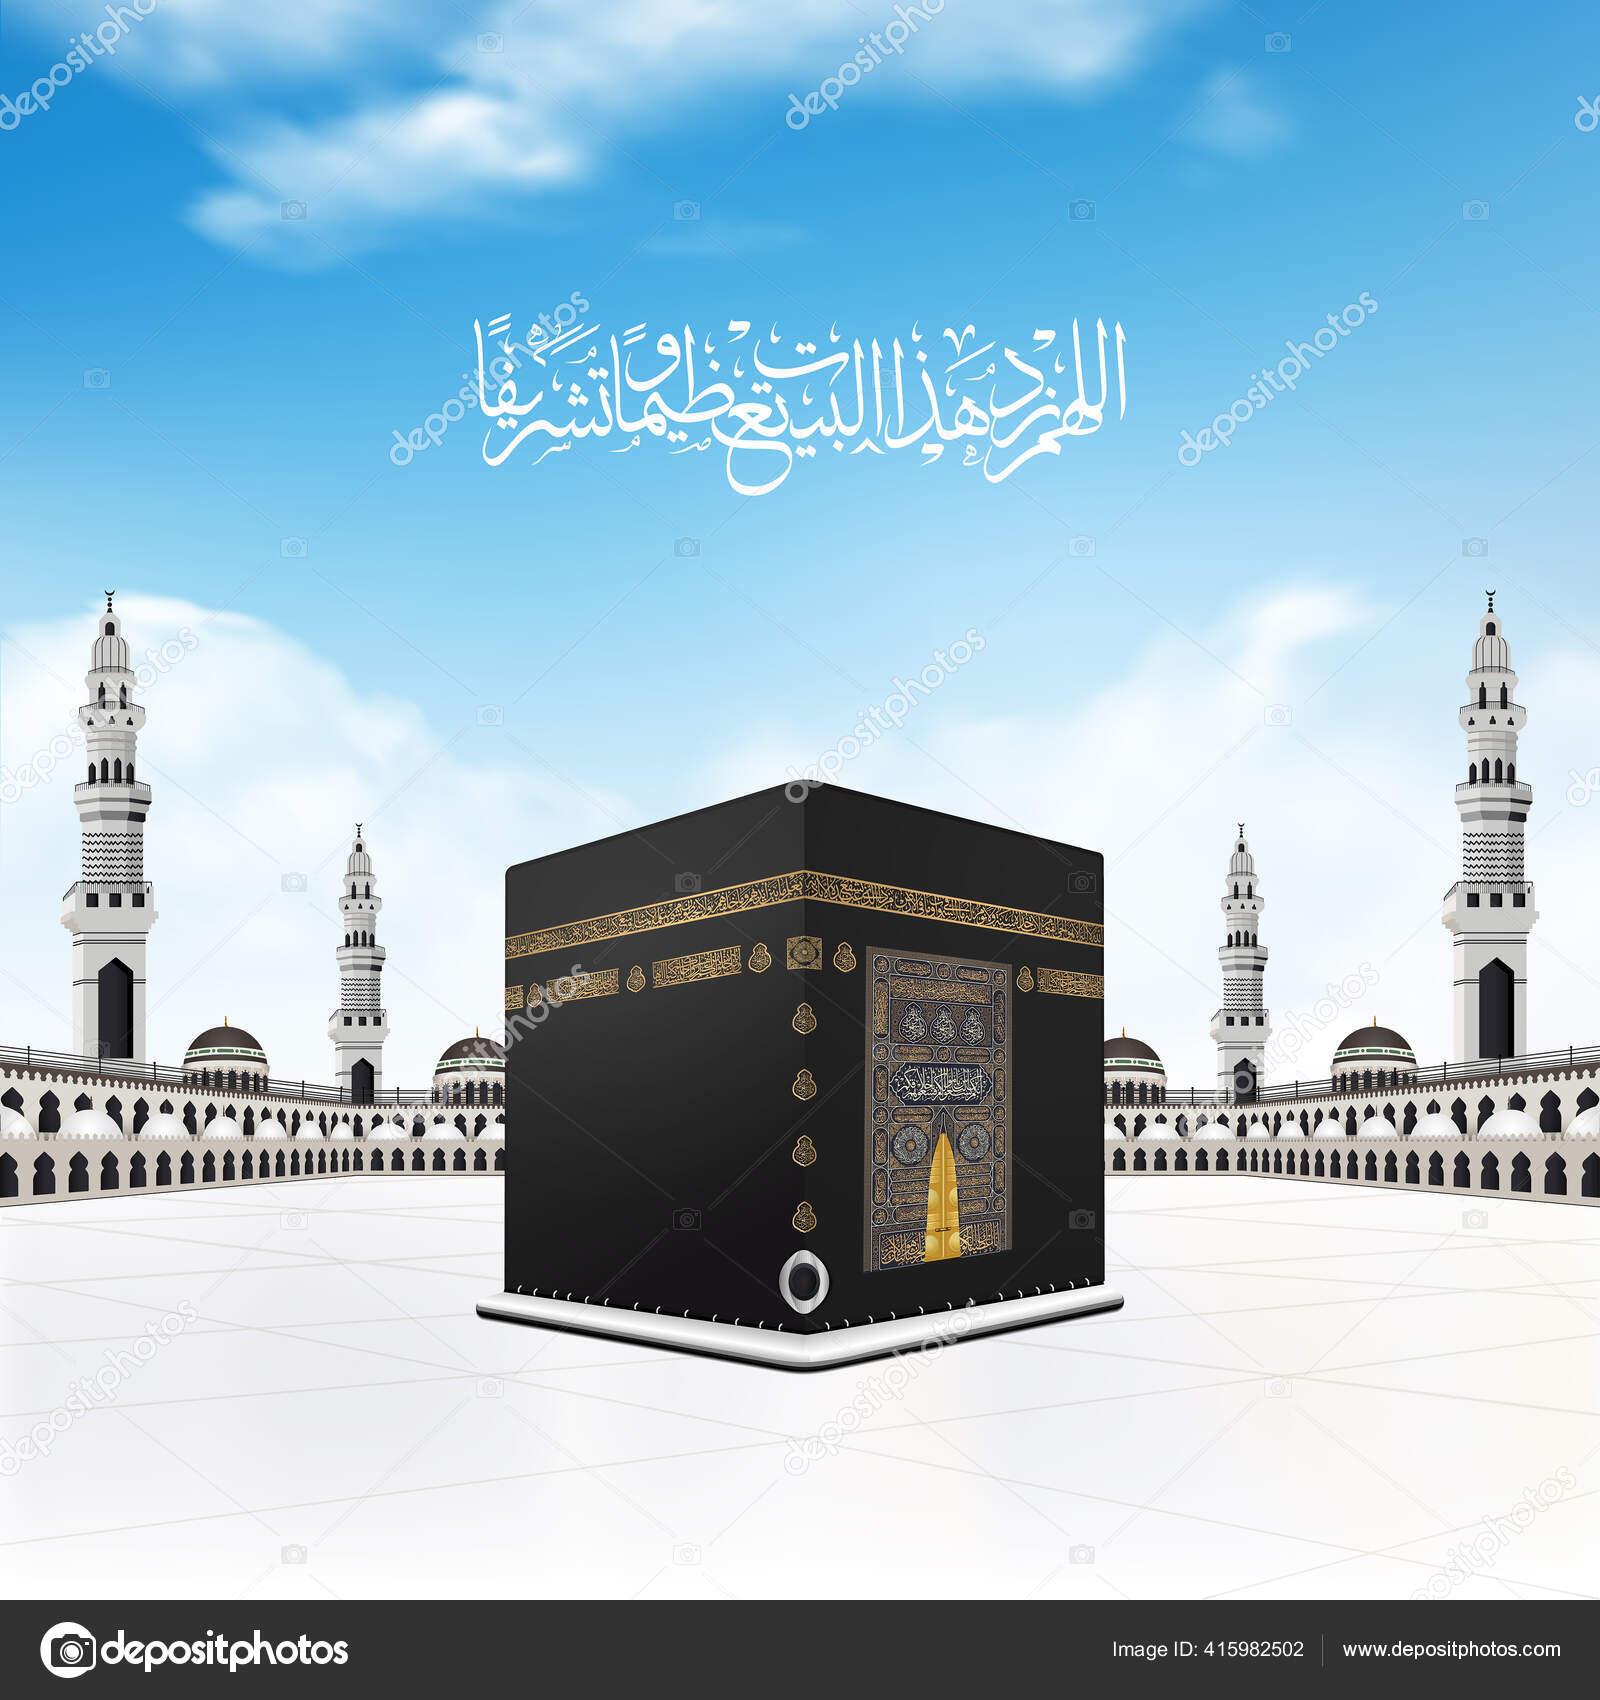 20 Arafat day Vector Images, Arafat day Illustrations   Depositphotos